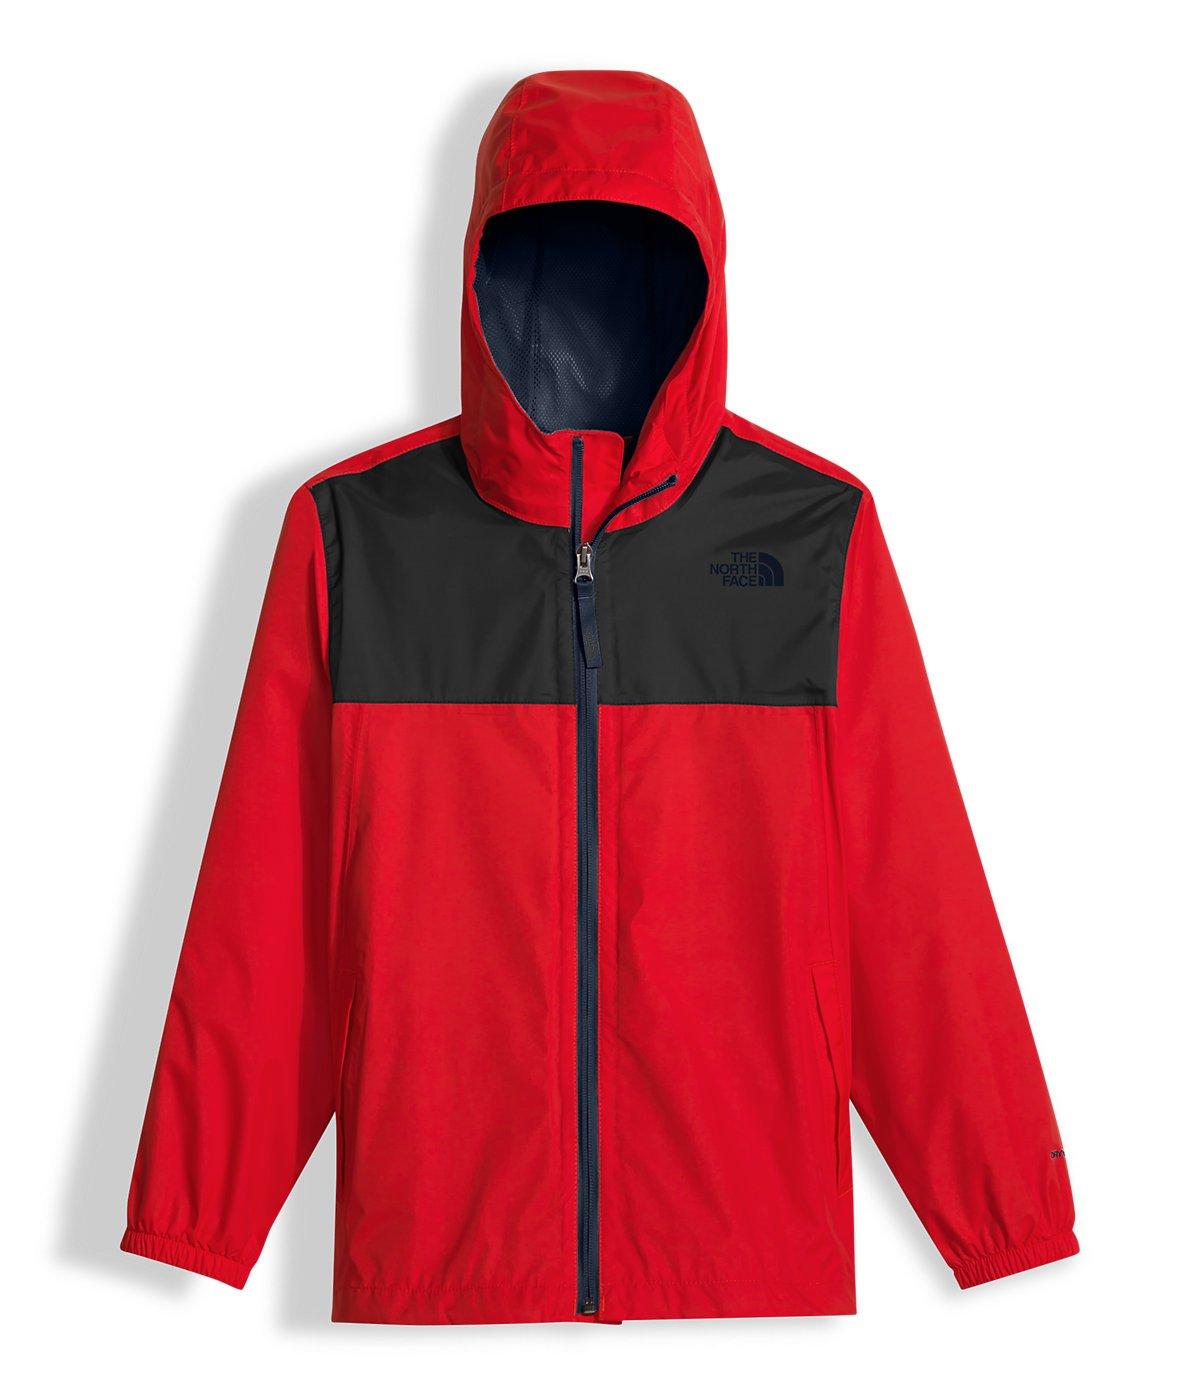 North Face Zipline Rain Jacket Big Kids Style : A2u3t-682 Size : M